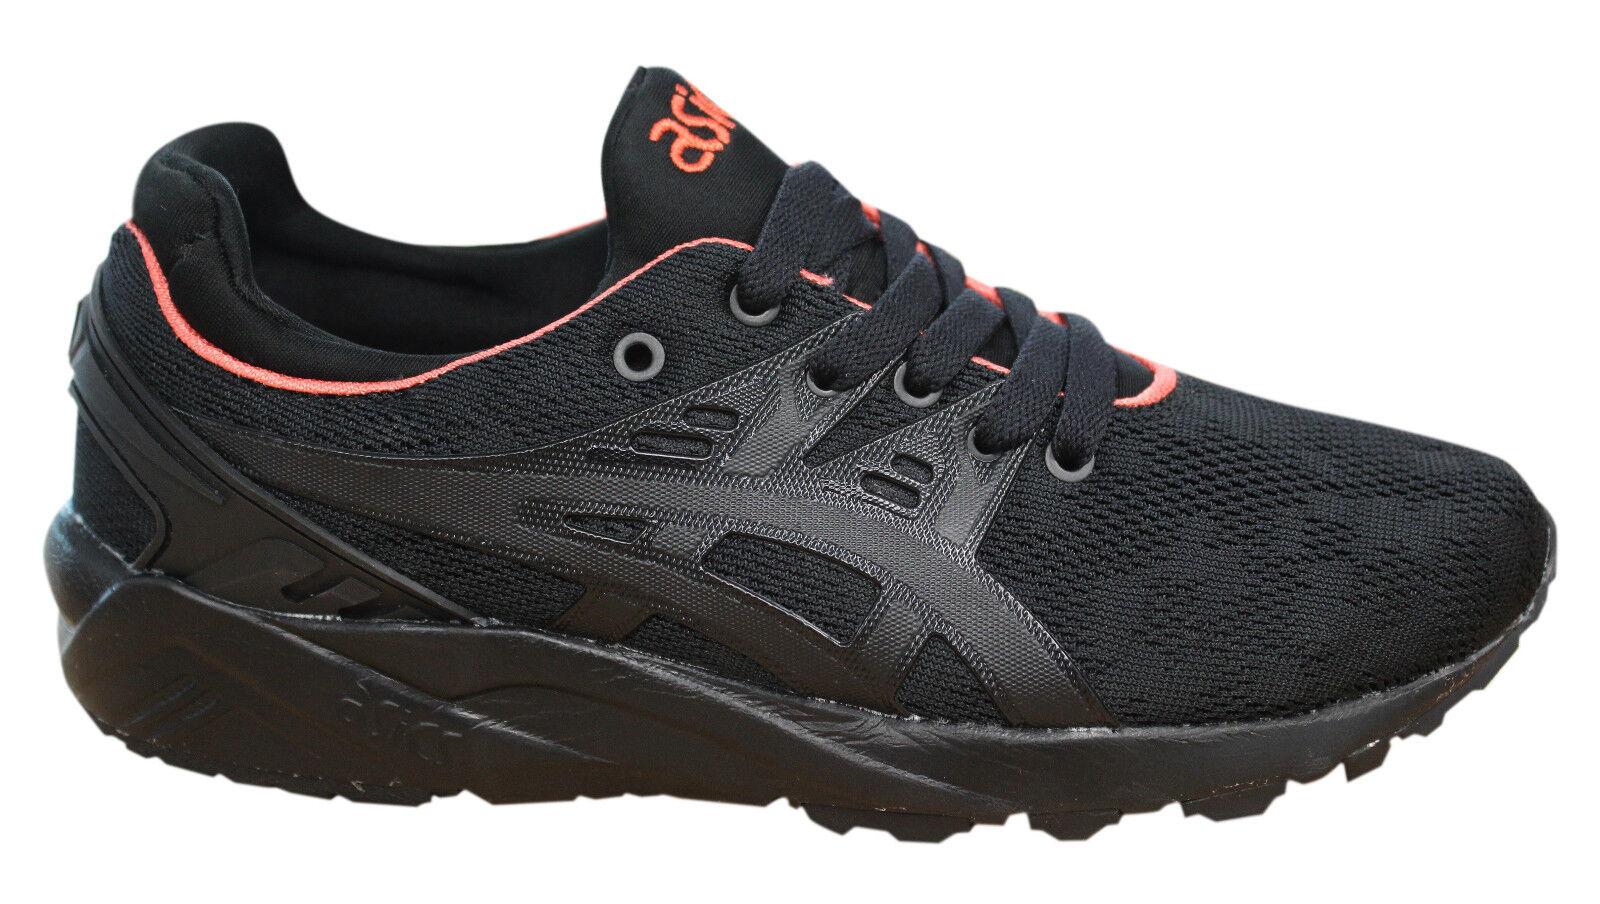 Asics Gel-Kayano Zapatillas EVO Zapatos Mujer Cordones Textil Negro h7q6n 9090